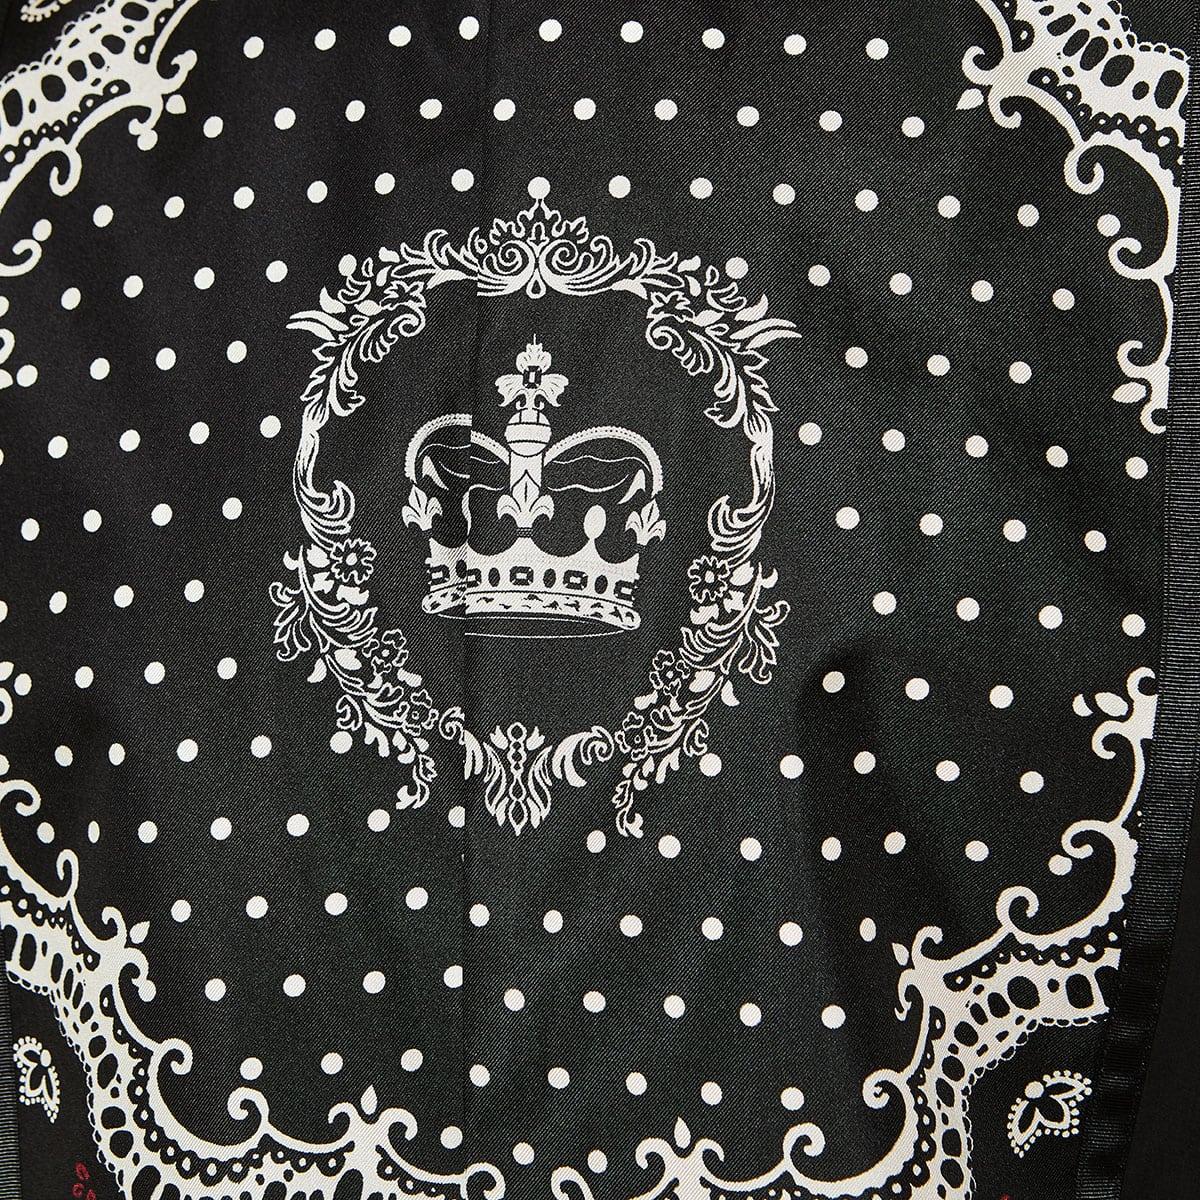 Printed-bib poplin shirt